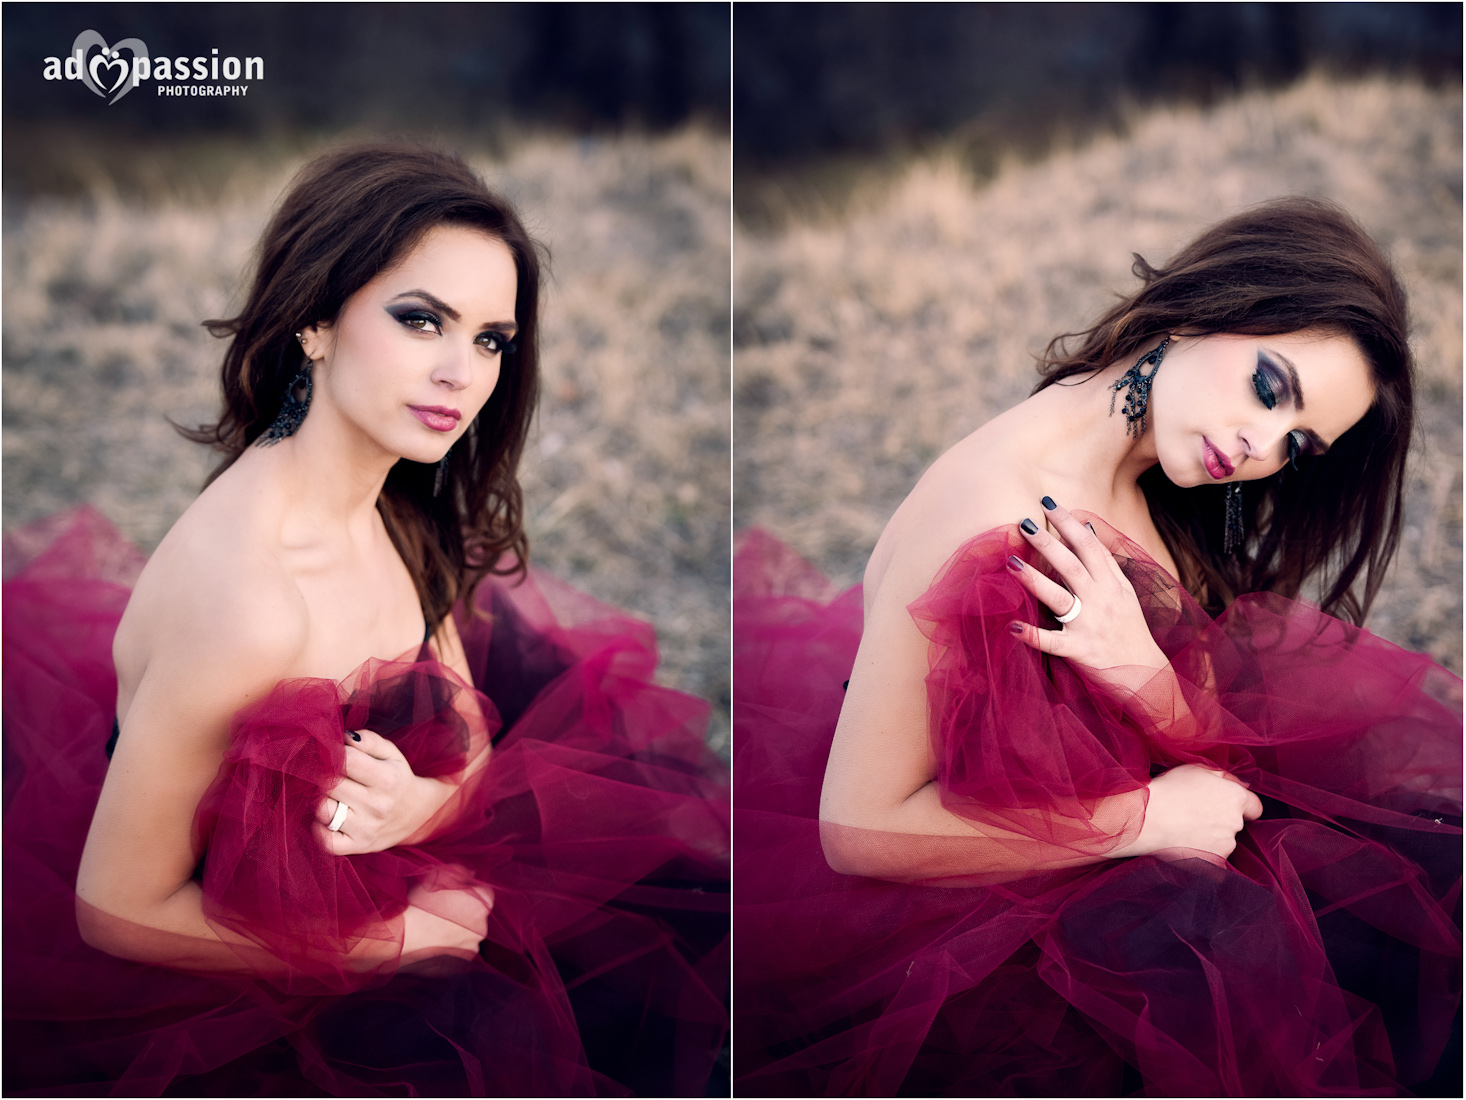 AD Passion Photography | alexandra_castelul_huniazilor_001 | Adelin, Dida, fotograf profesionist, fotograf de nunta, fotografie de nunta, fotograf Timisoara, fotograf Craiova, fotograf Bucuresti, fotograf Arad, nunta Timisoara, nunta Arad, nunta Bucuresti, nunta Craiova